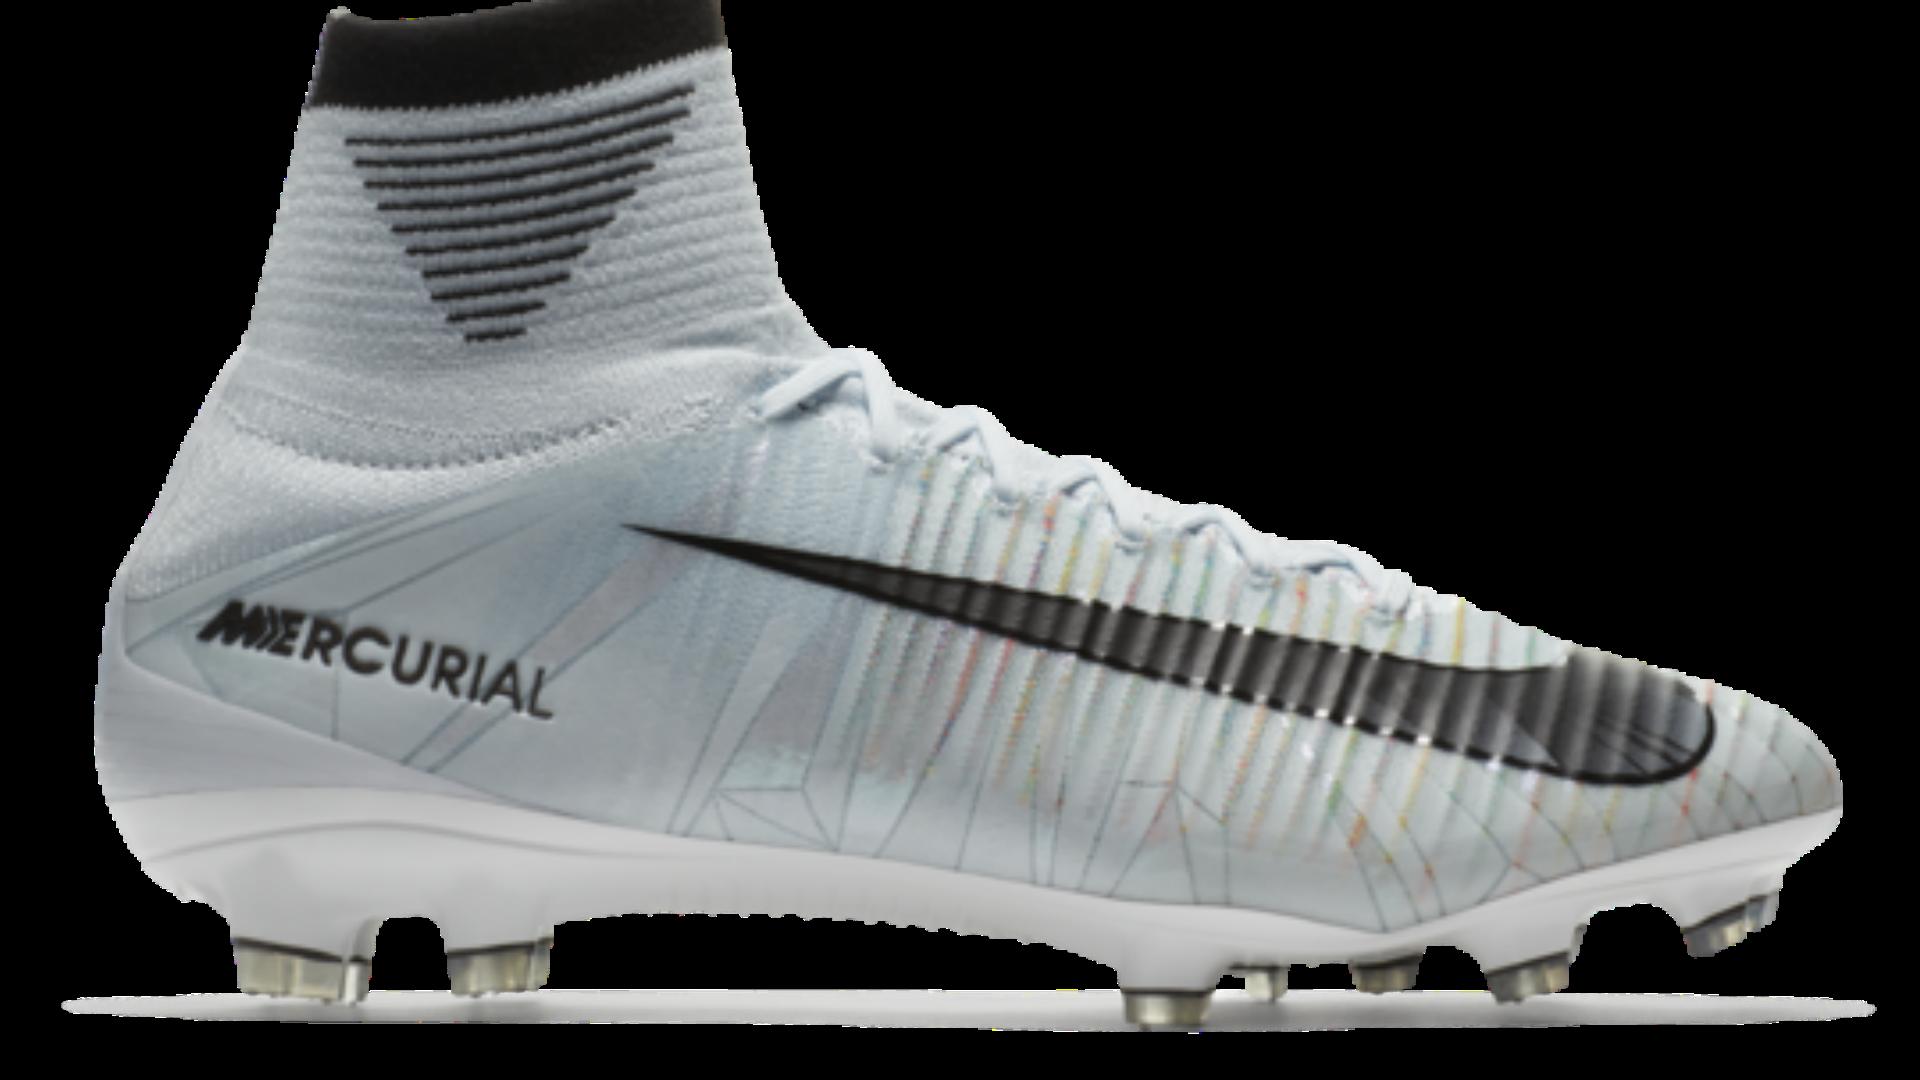 Nike lança nova chuteira de Cristiano Ronaldo intitulada